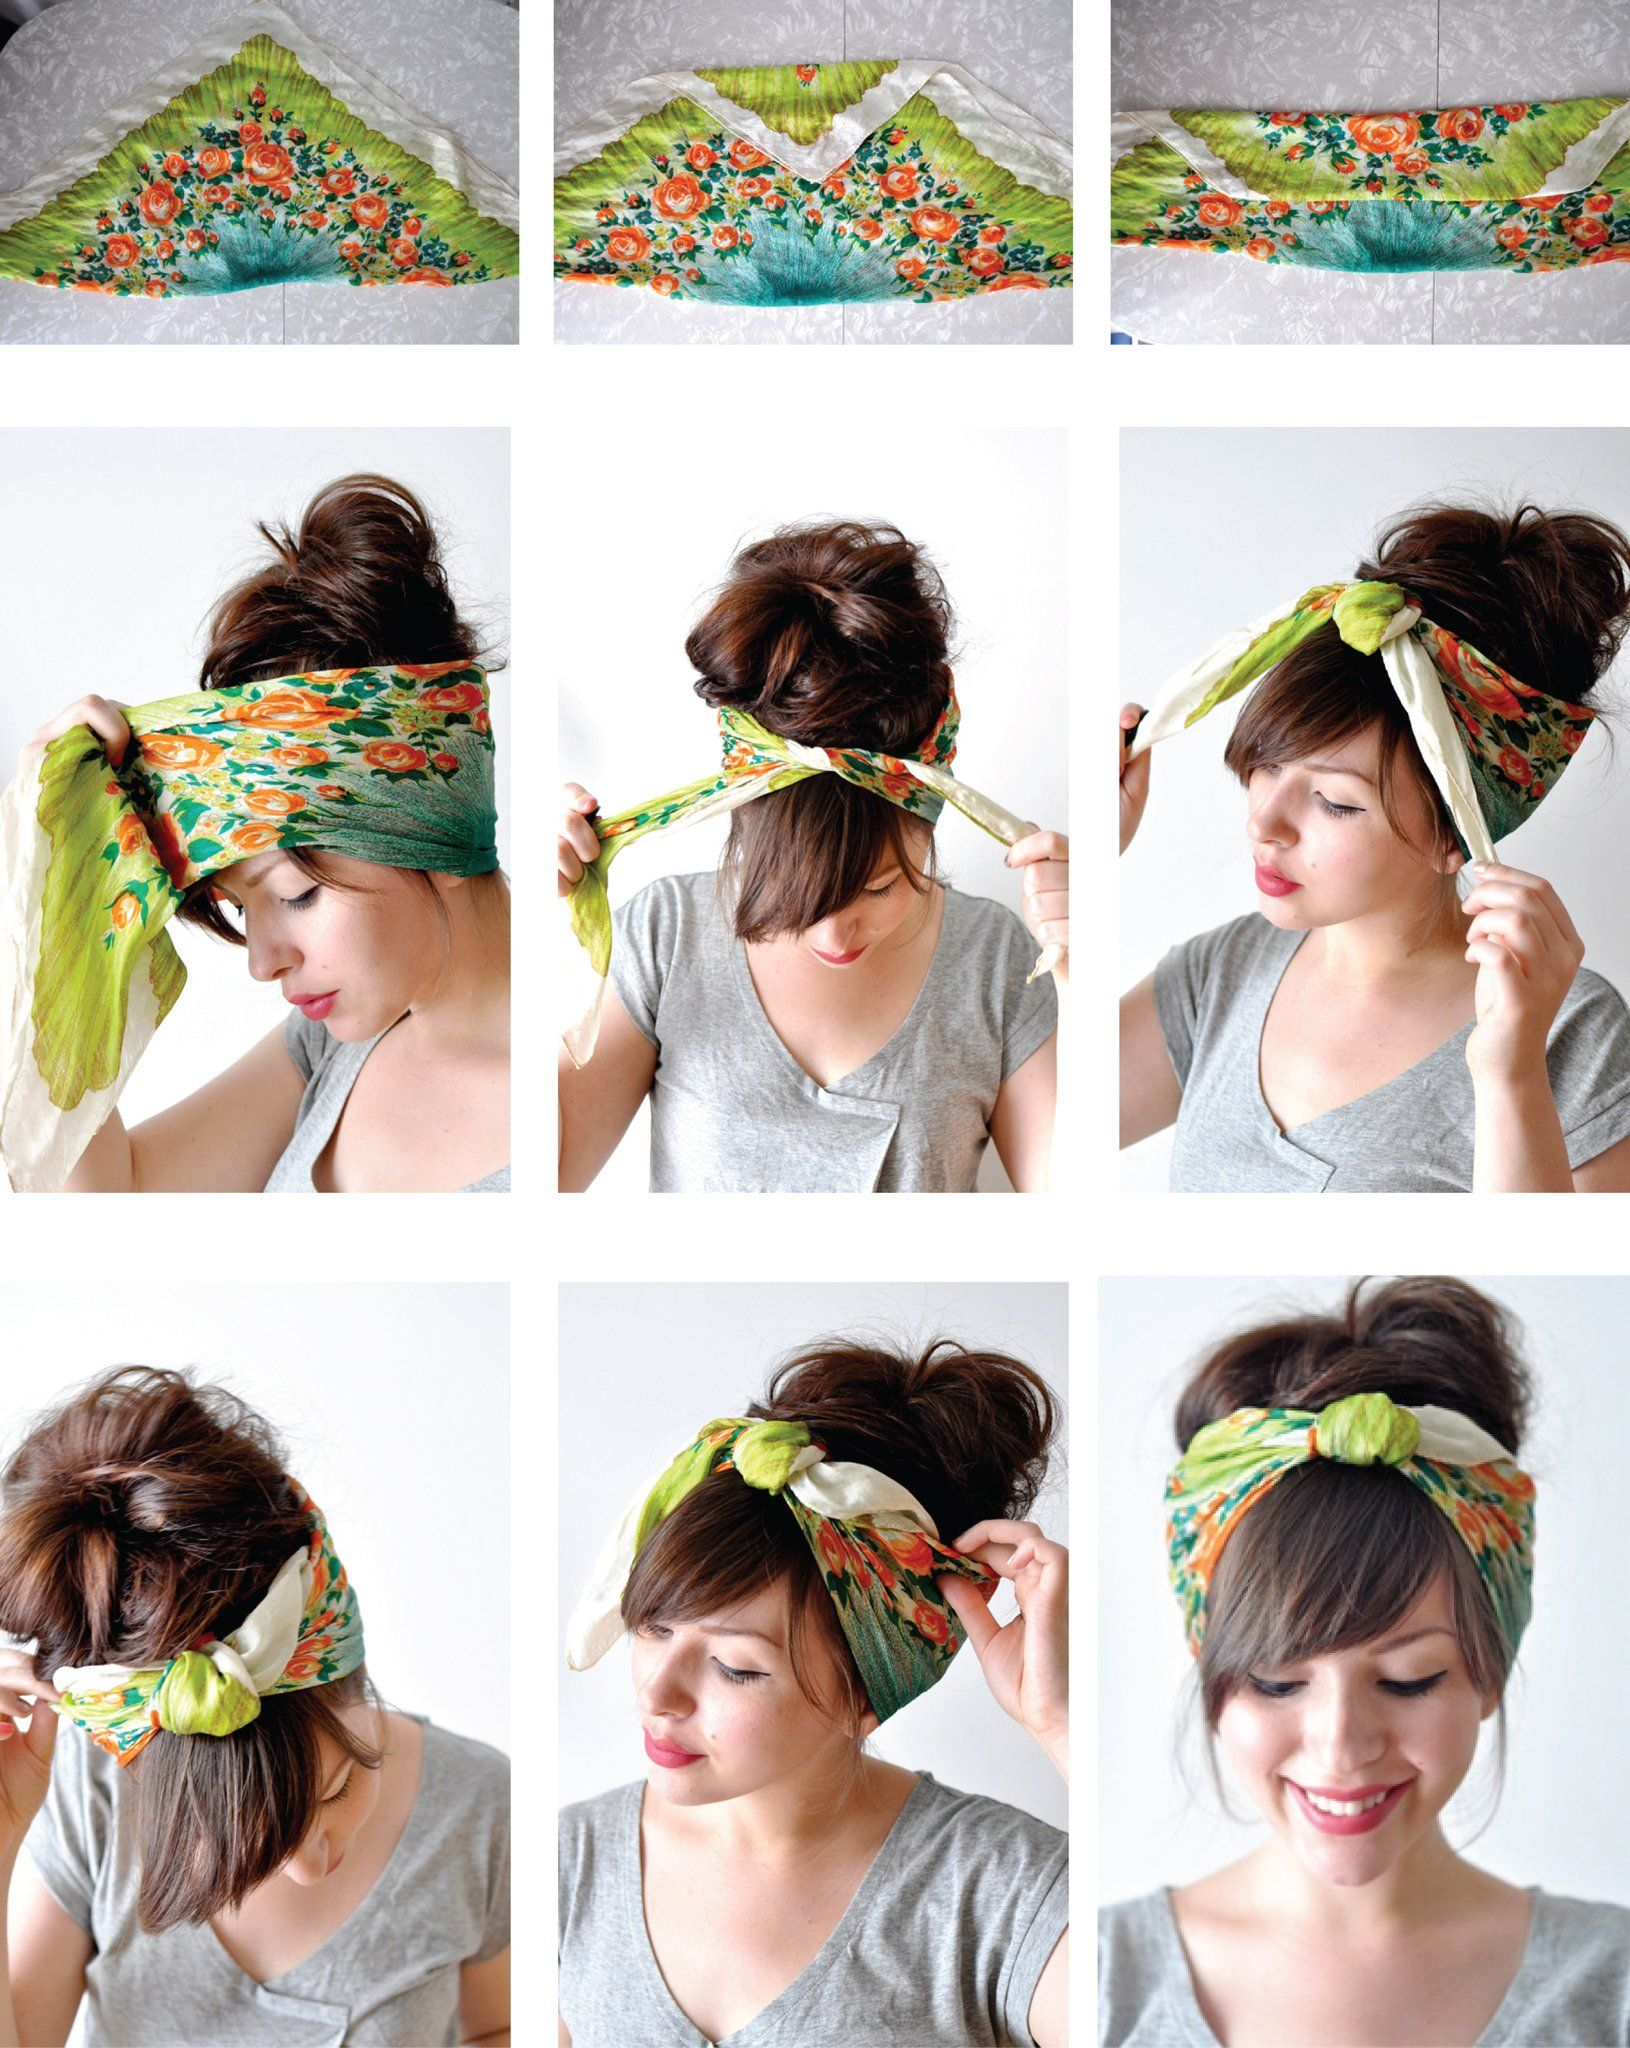 Pin by Helga Zambrana on pelitos   Hair styles, Scarf hairstyles ...